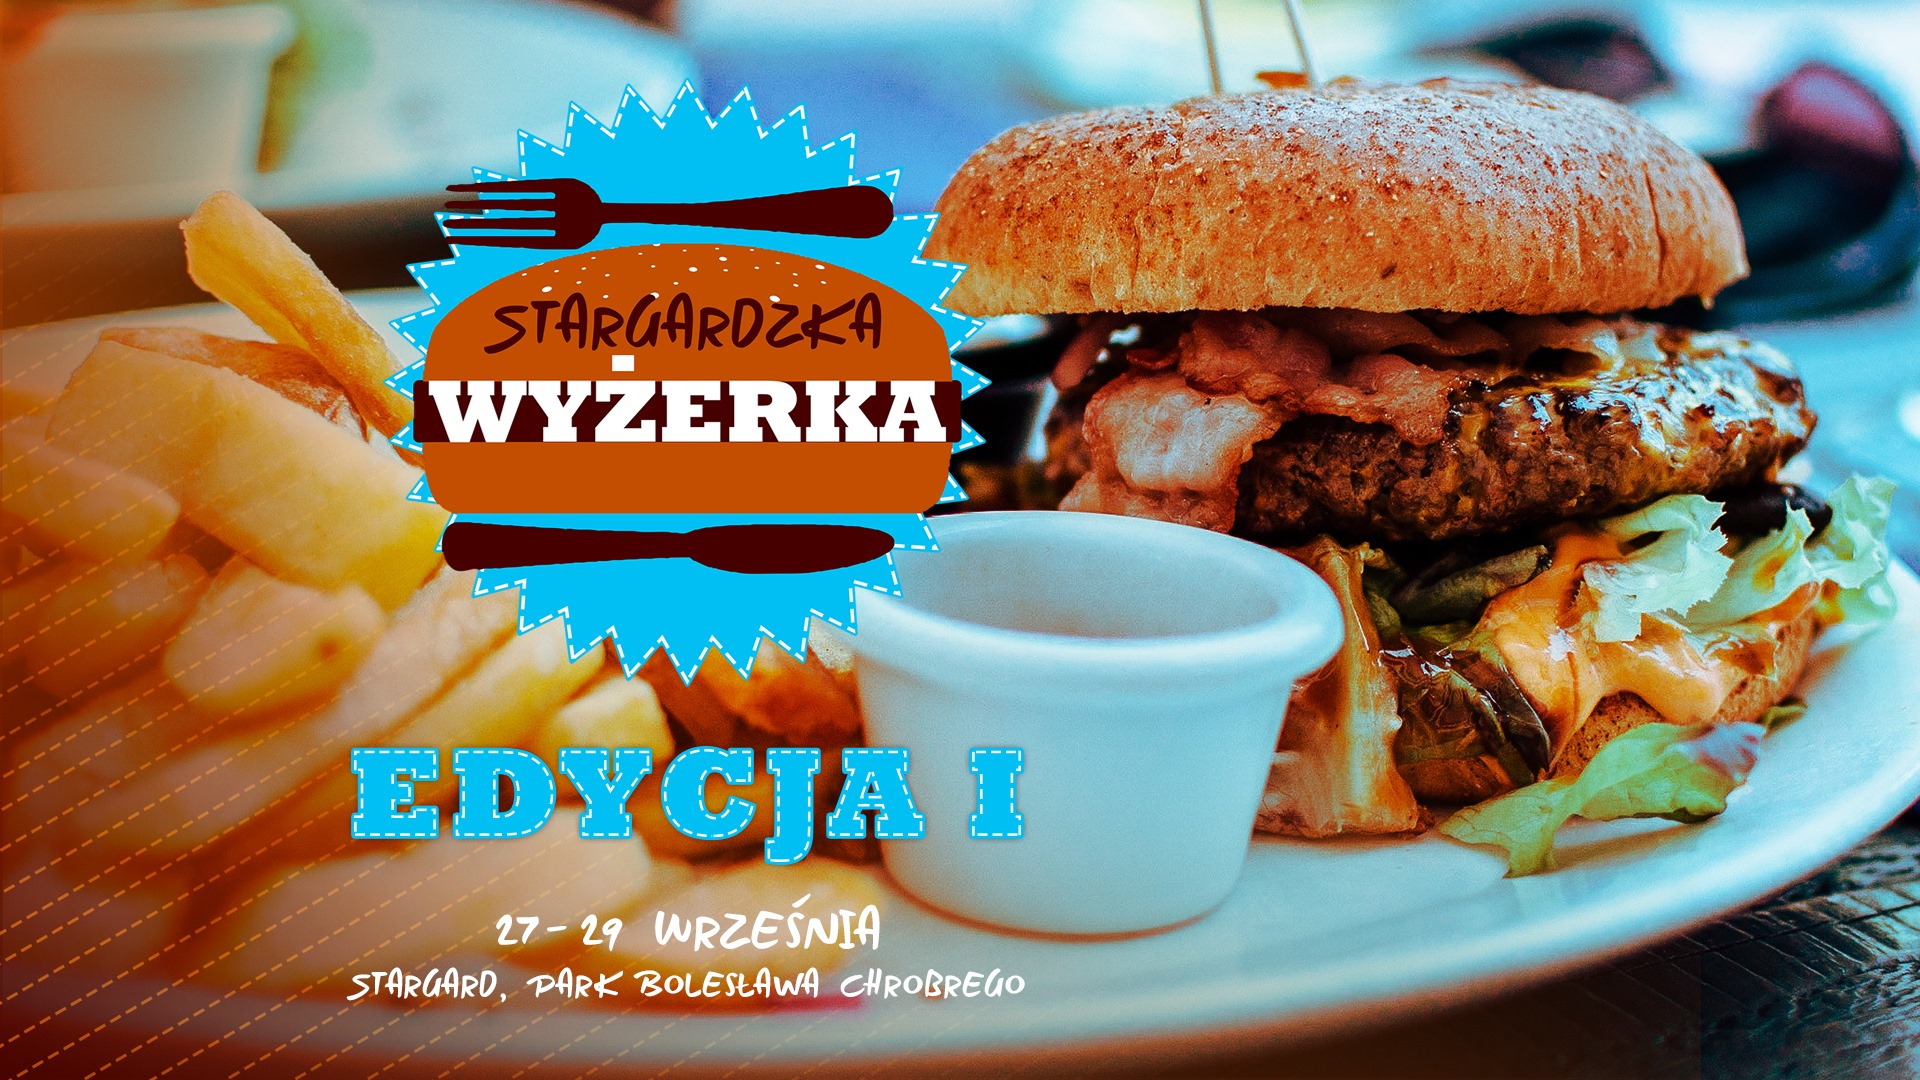 Stargardzka Wyżerka - festiwal food trucków